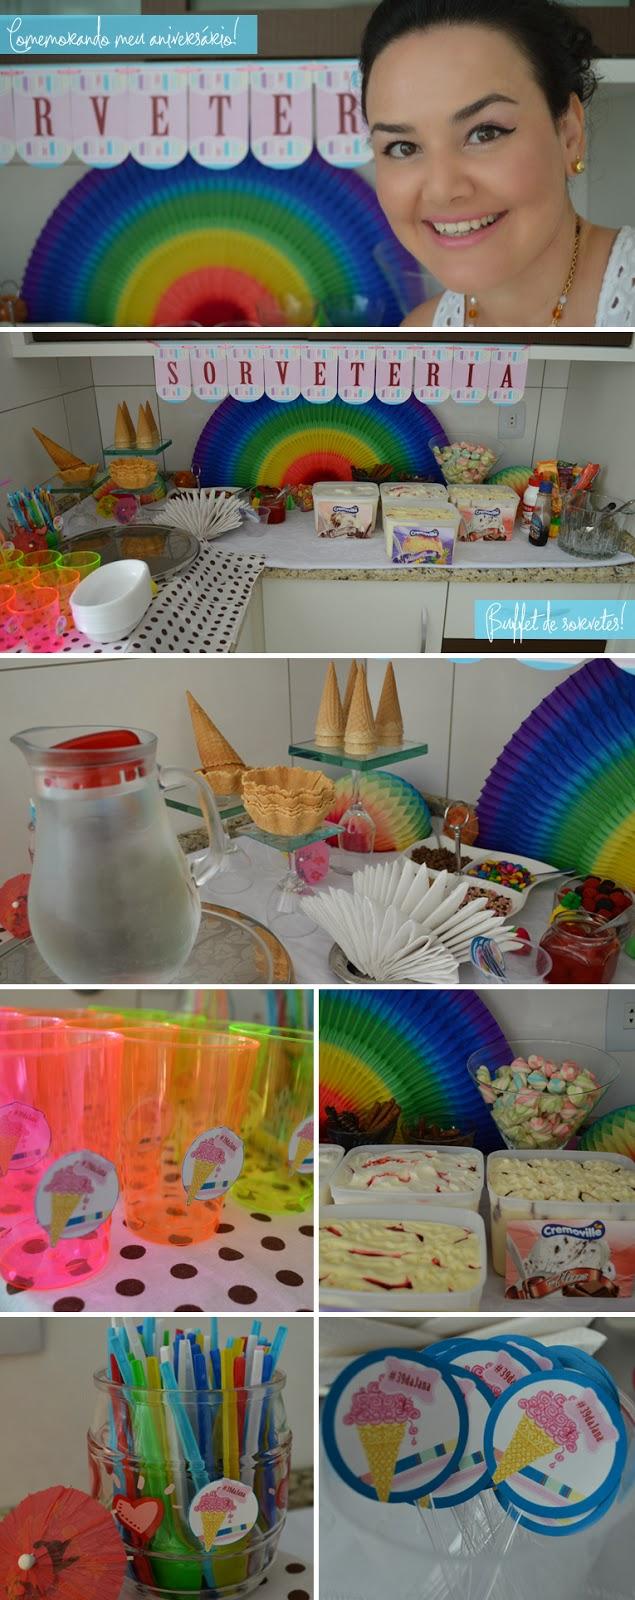 Aniversário, sorveteria, buffet de sorvetes, cremoville, Aniversário #39dajana, blogger, blogueira, joinville